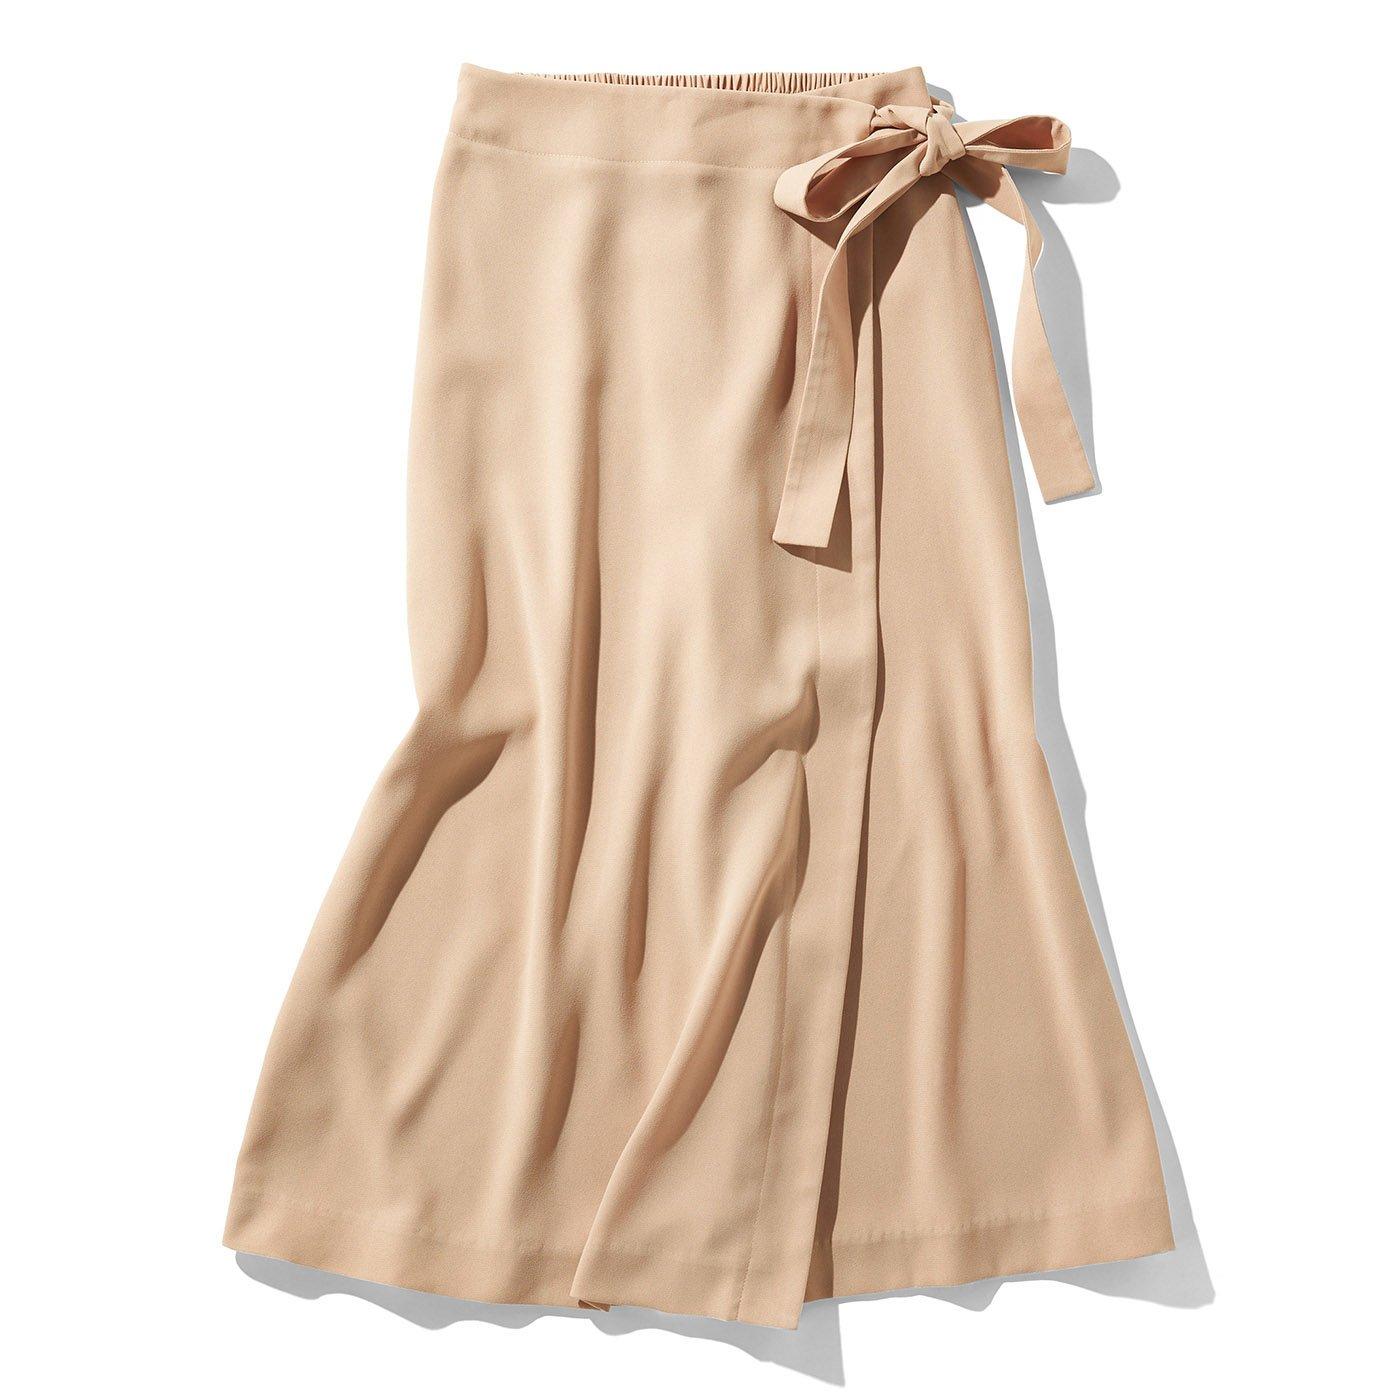 IEDIT サイドリボンのディテールが女っぽいラップスカート風パンツ〈ライトベージュ〉